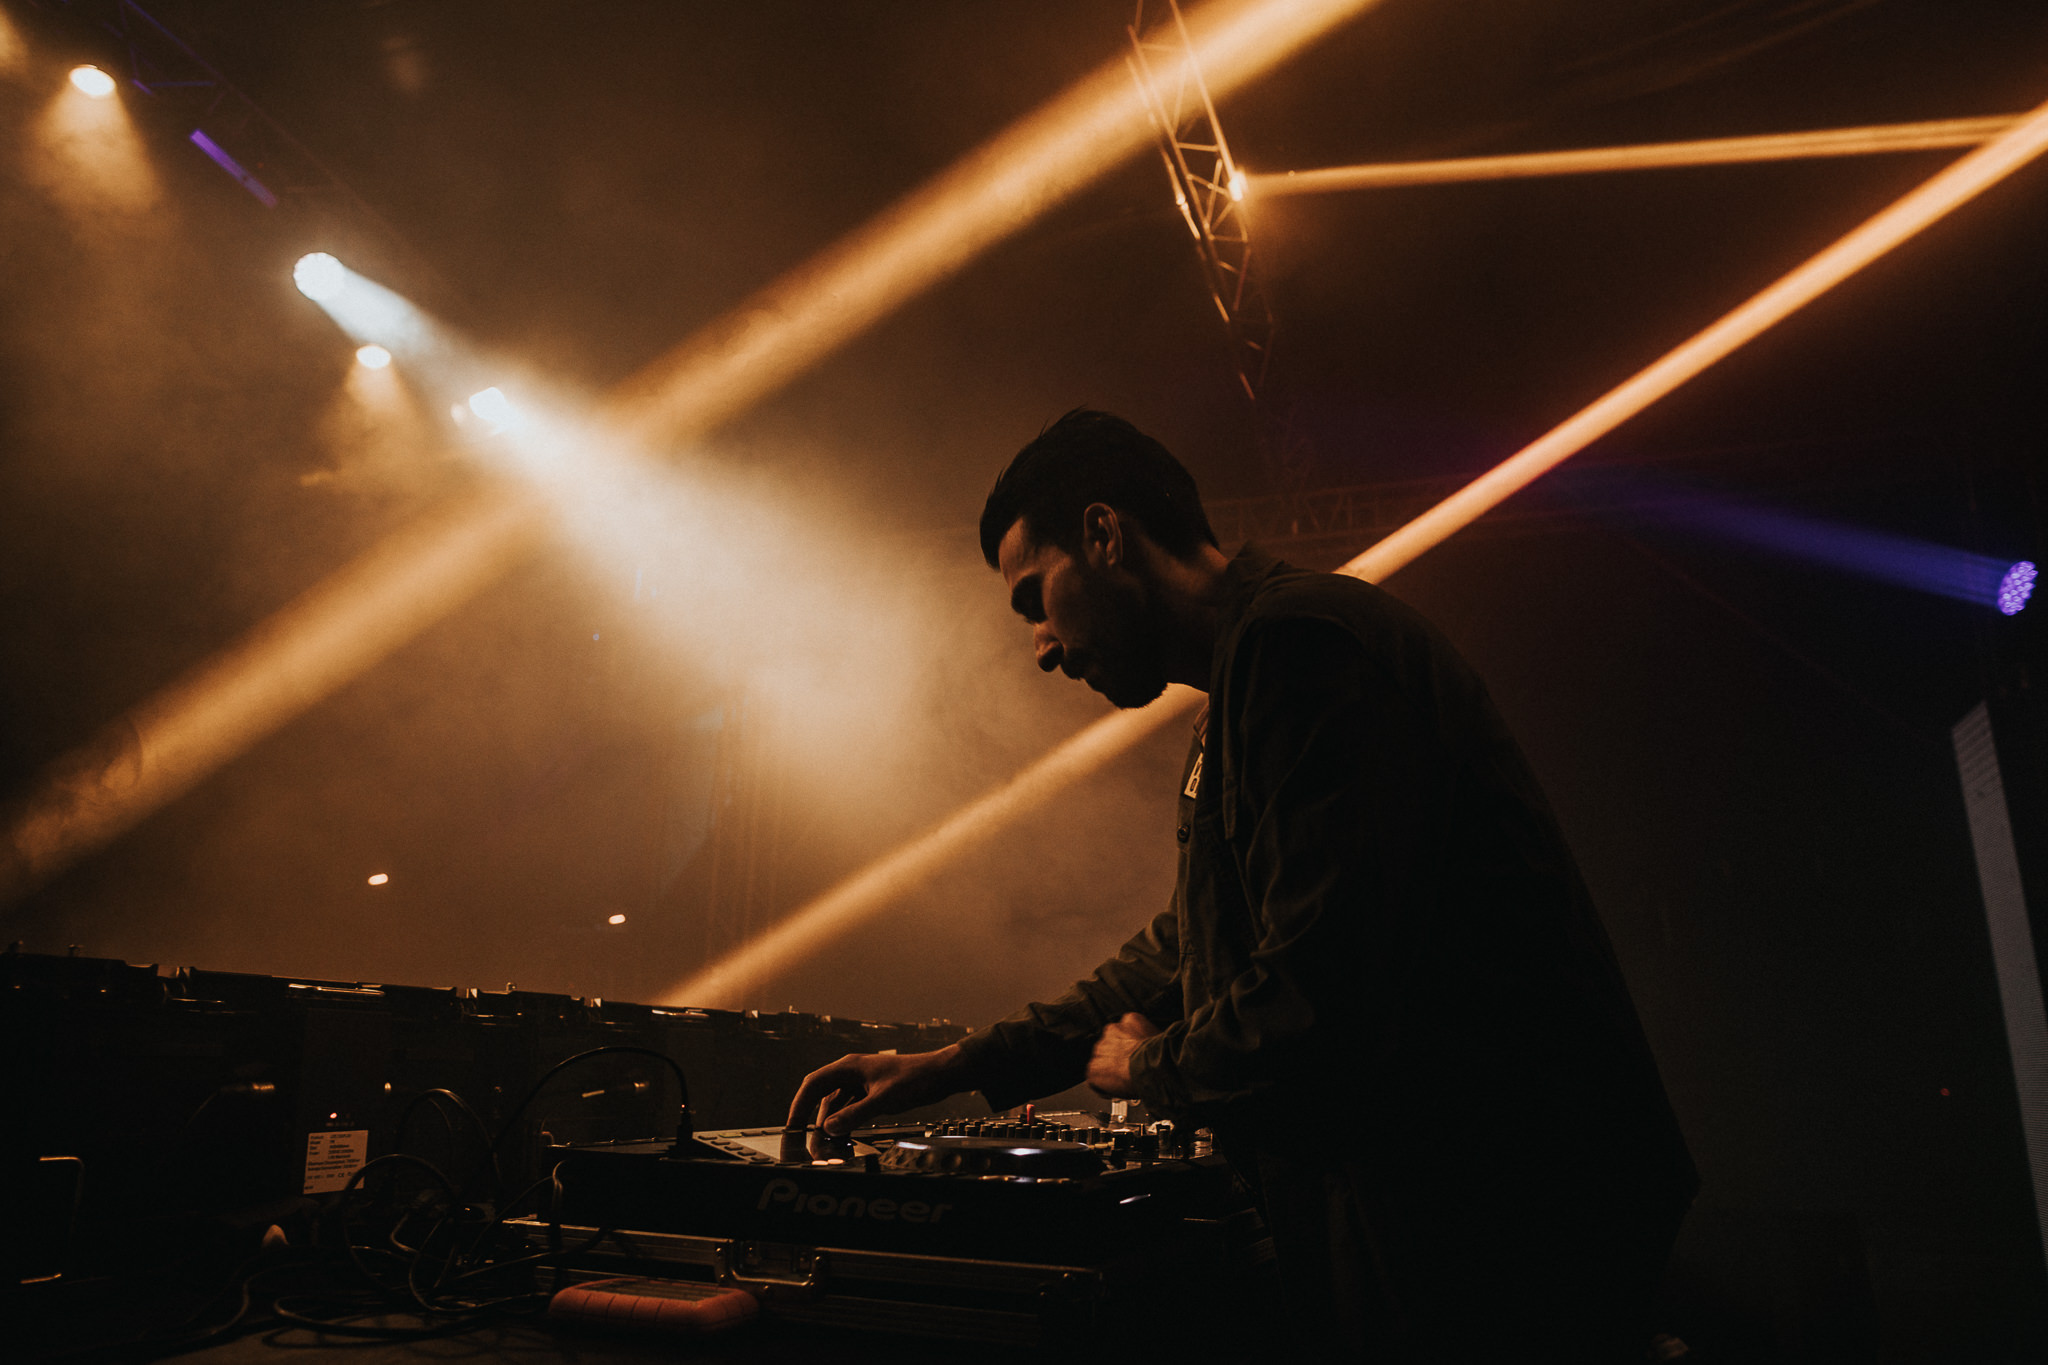 2017-06-23-DJ-FLASH-DREAMIN-TOM-BARBIER-7090-LD.jpg